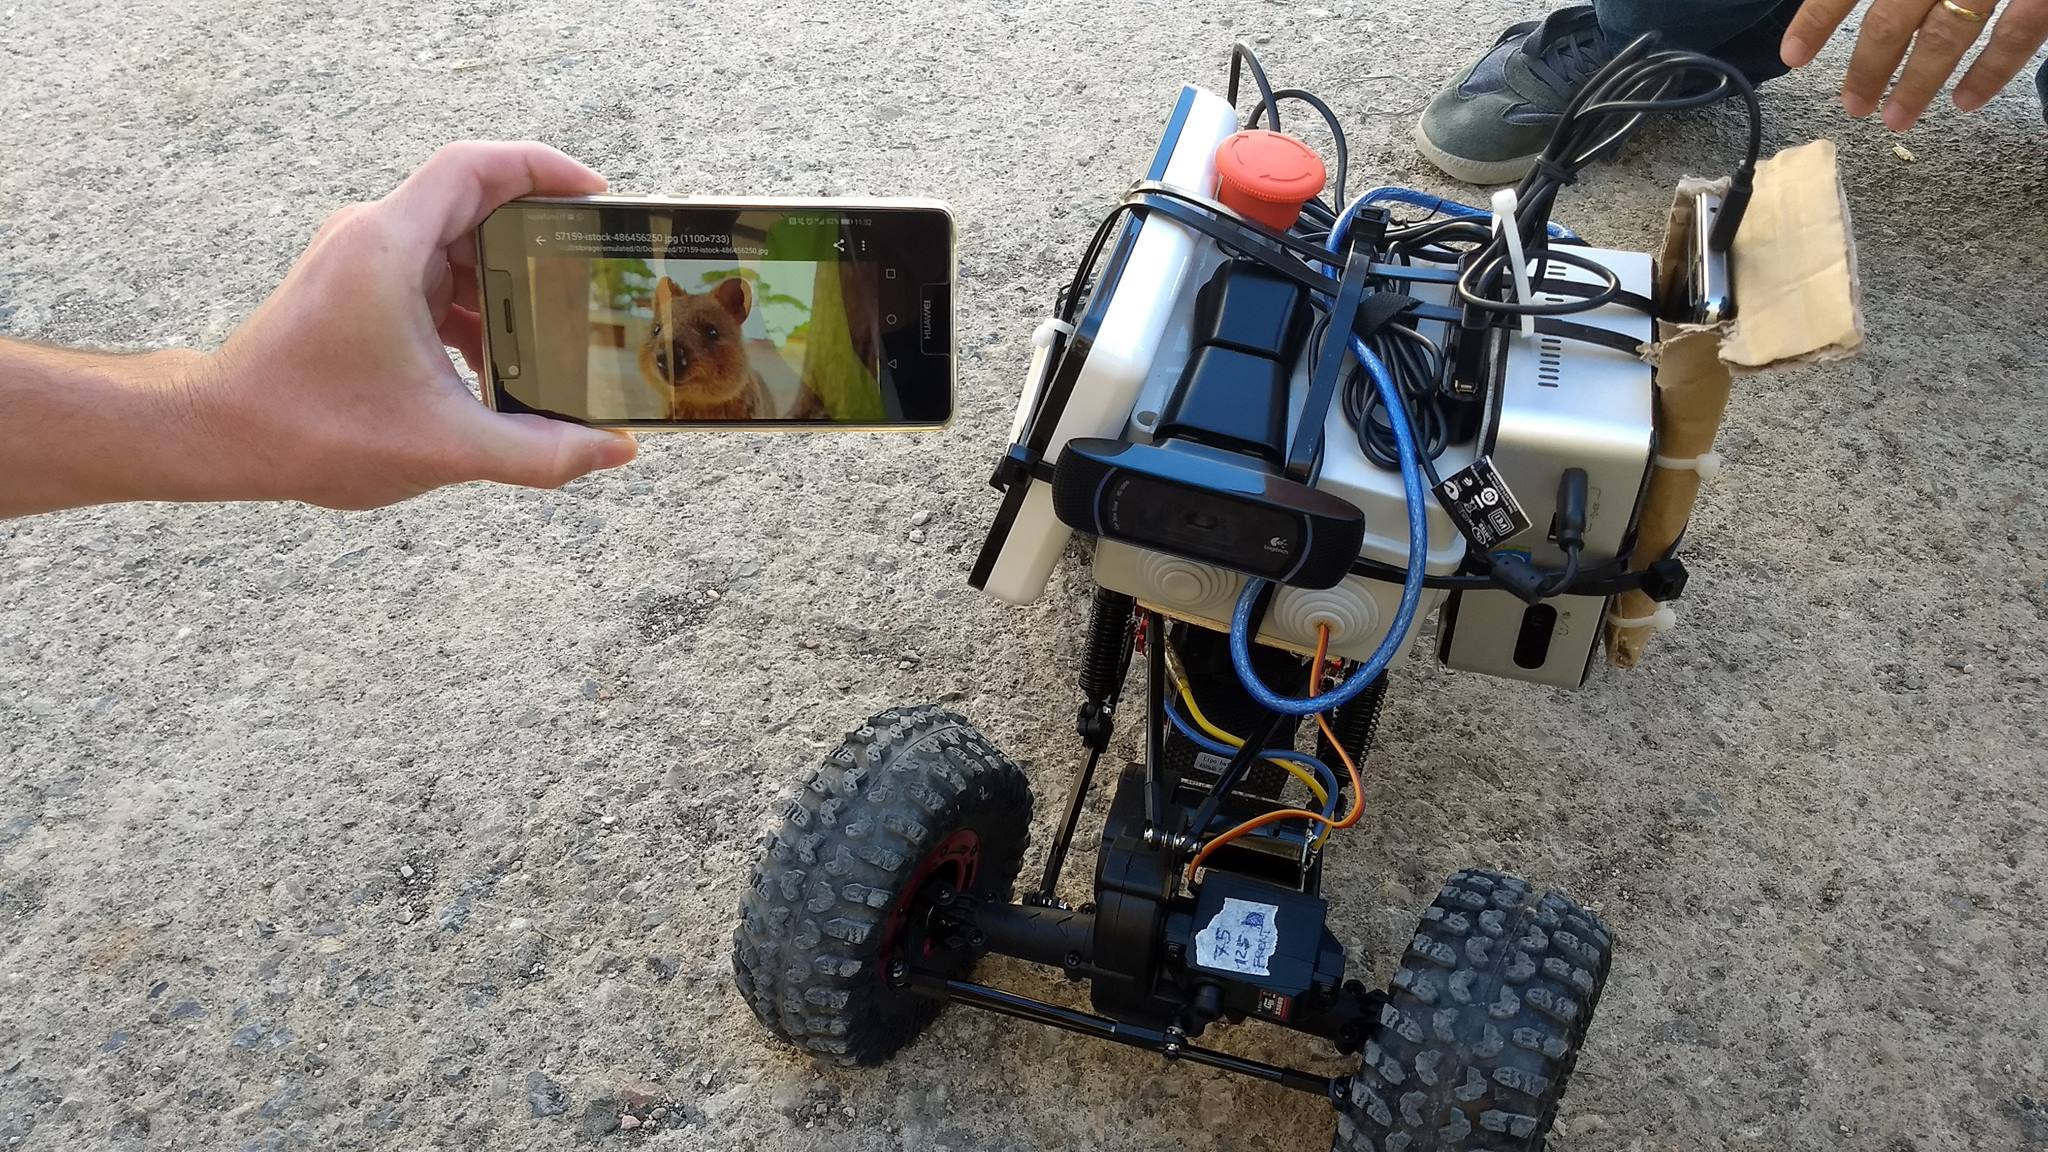 Researches intelligent robotics amp mechatronic system laboratory -  And